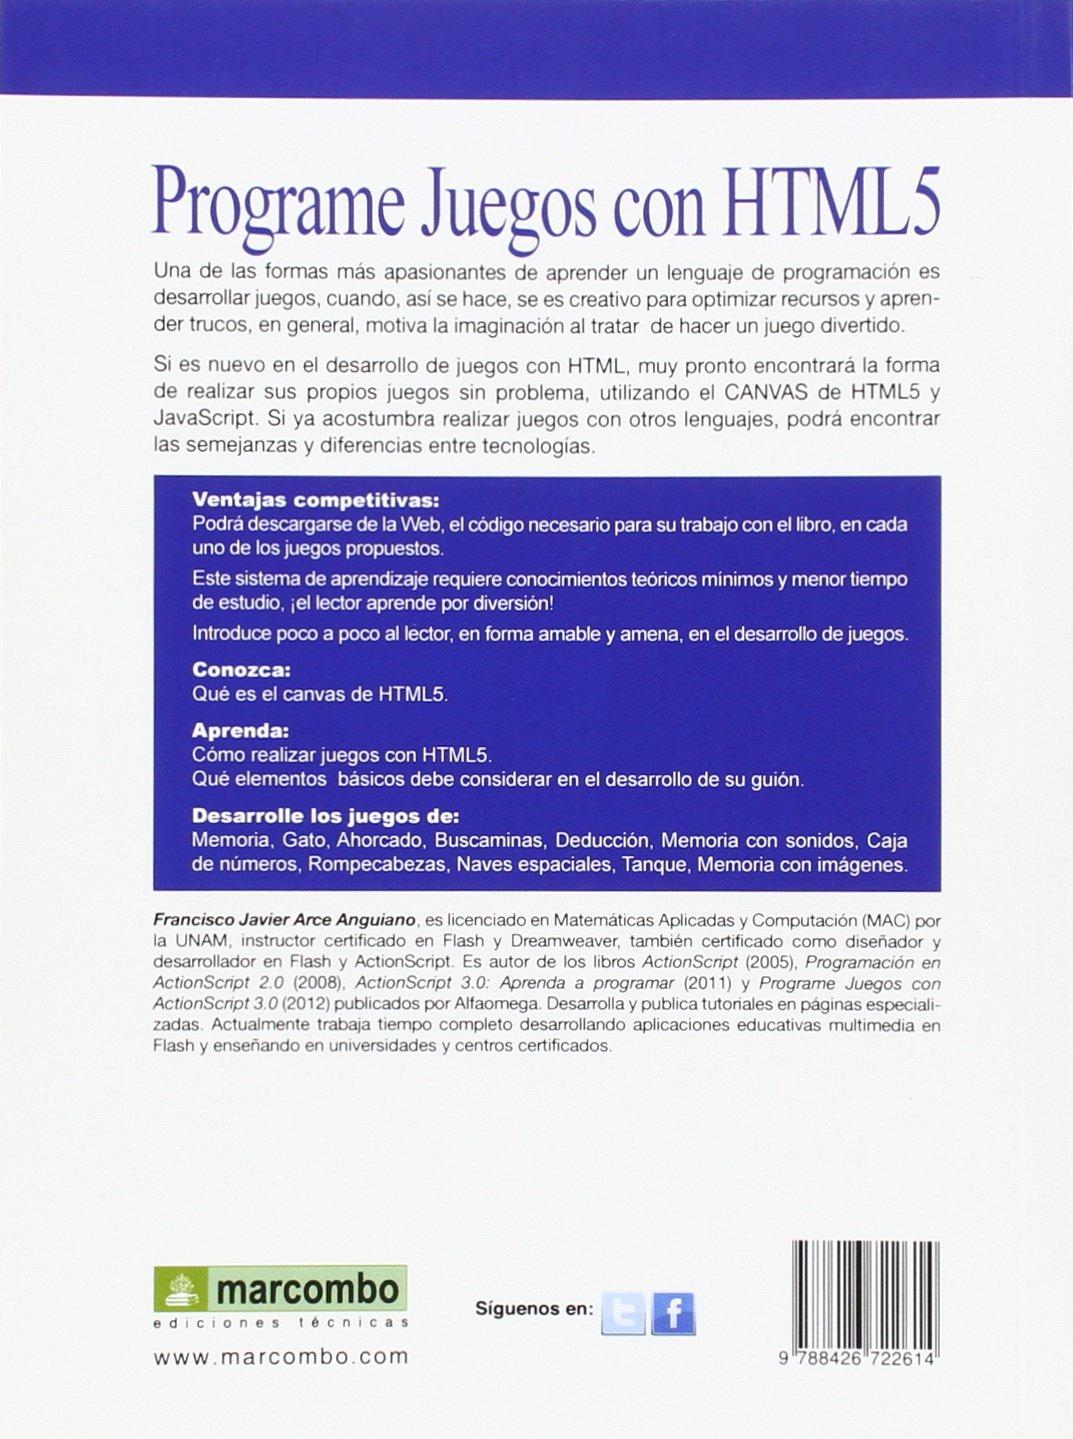 Programe juegos con HTML5: Francisco Javier Arce Anguiano: 9788426722614: Amazon.com: Books